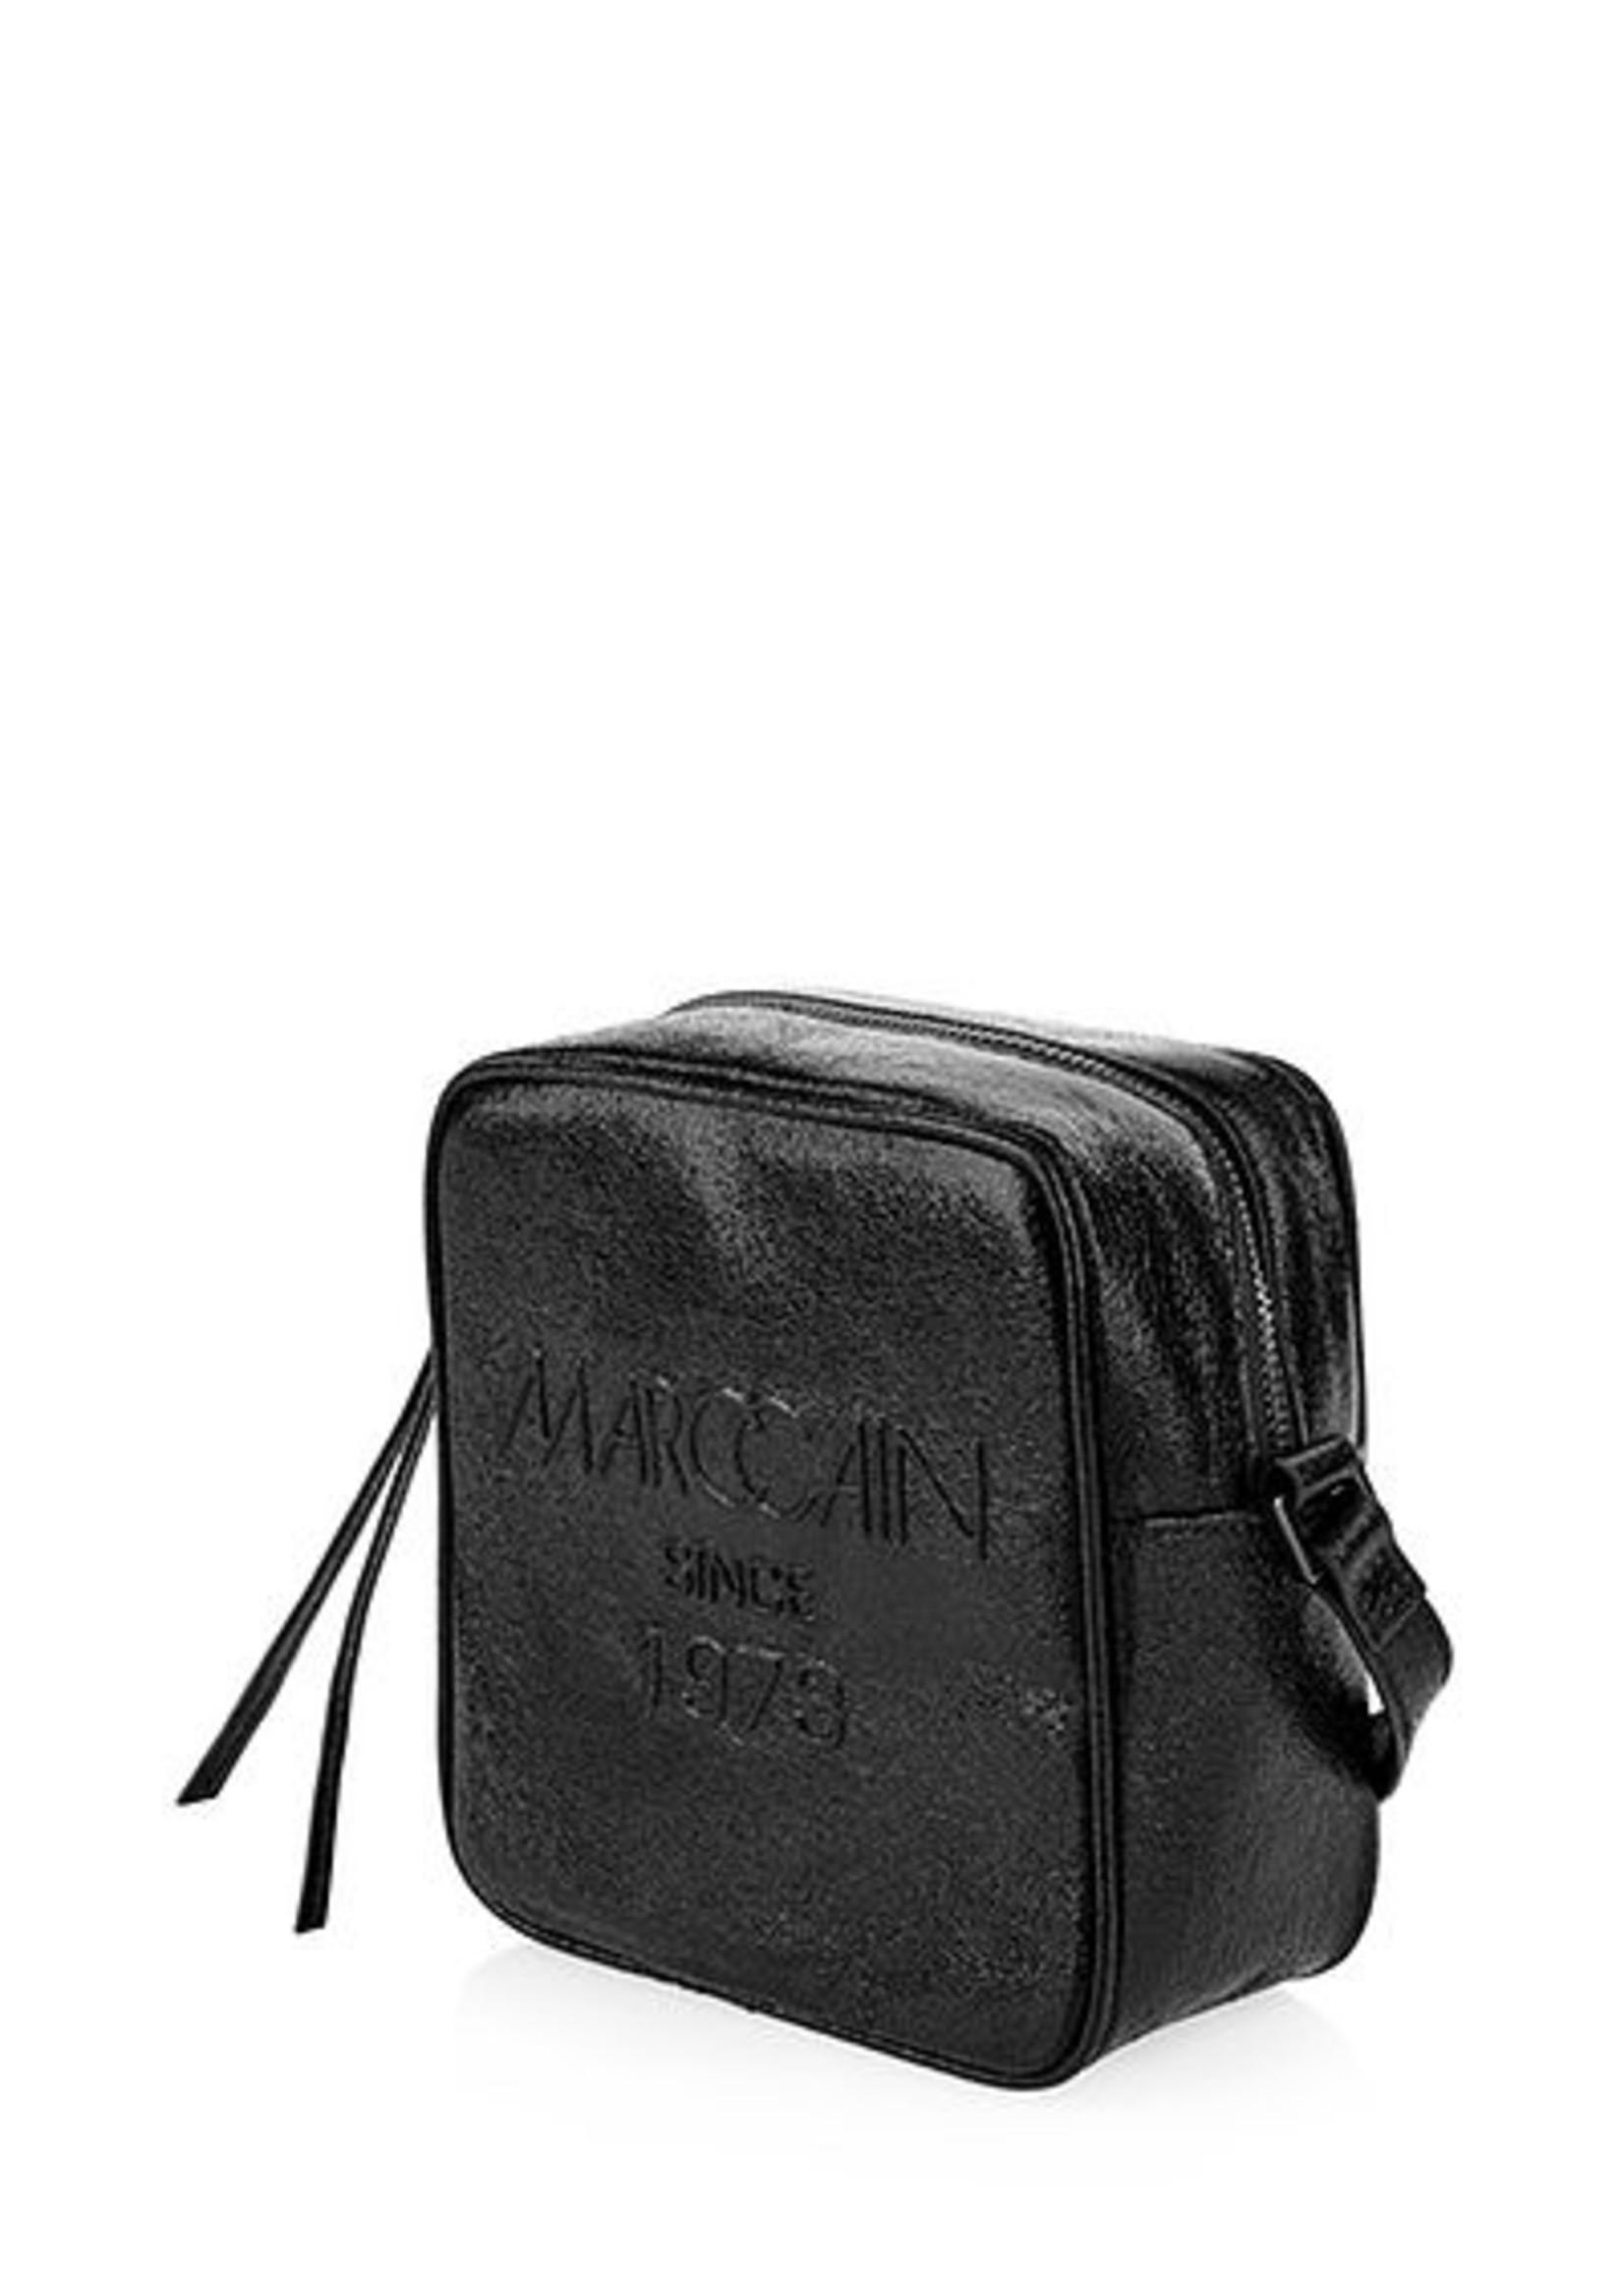 Marccain Bags & Shoes Shopper RB TI.08 Z04 black